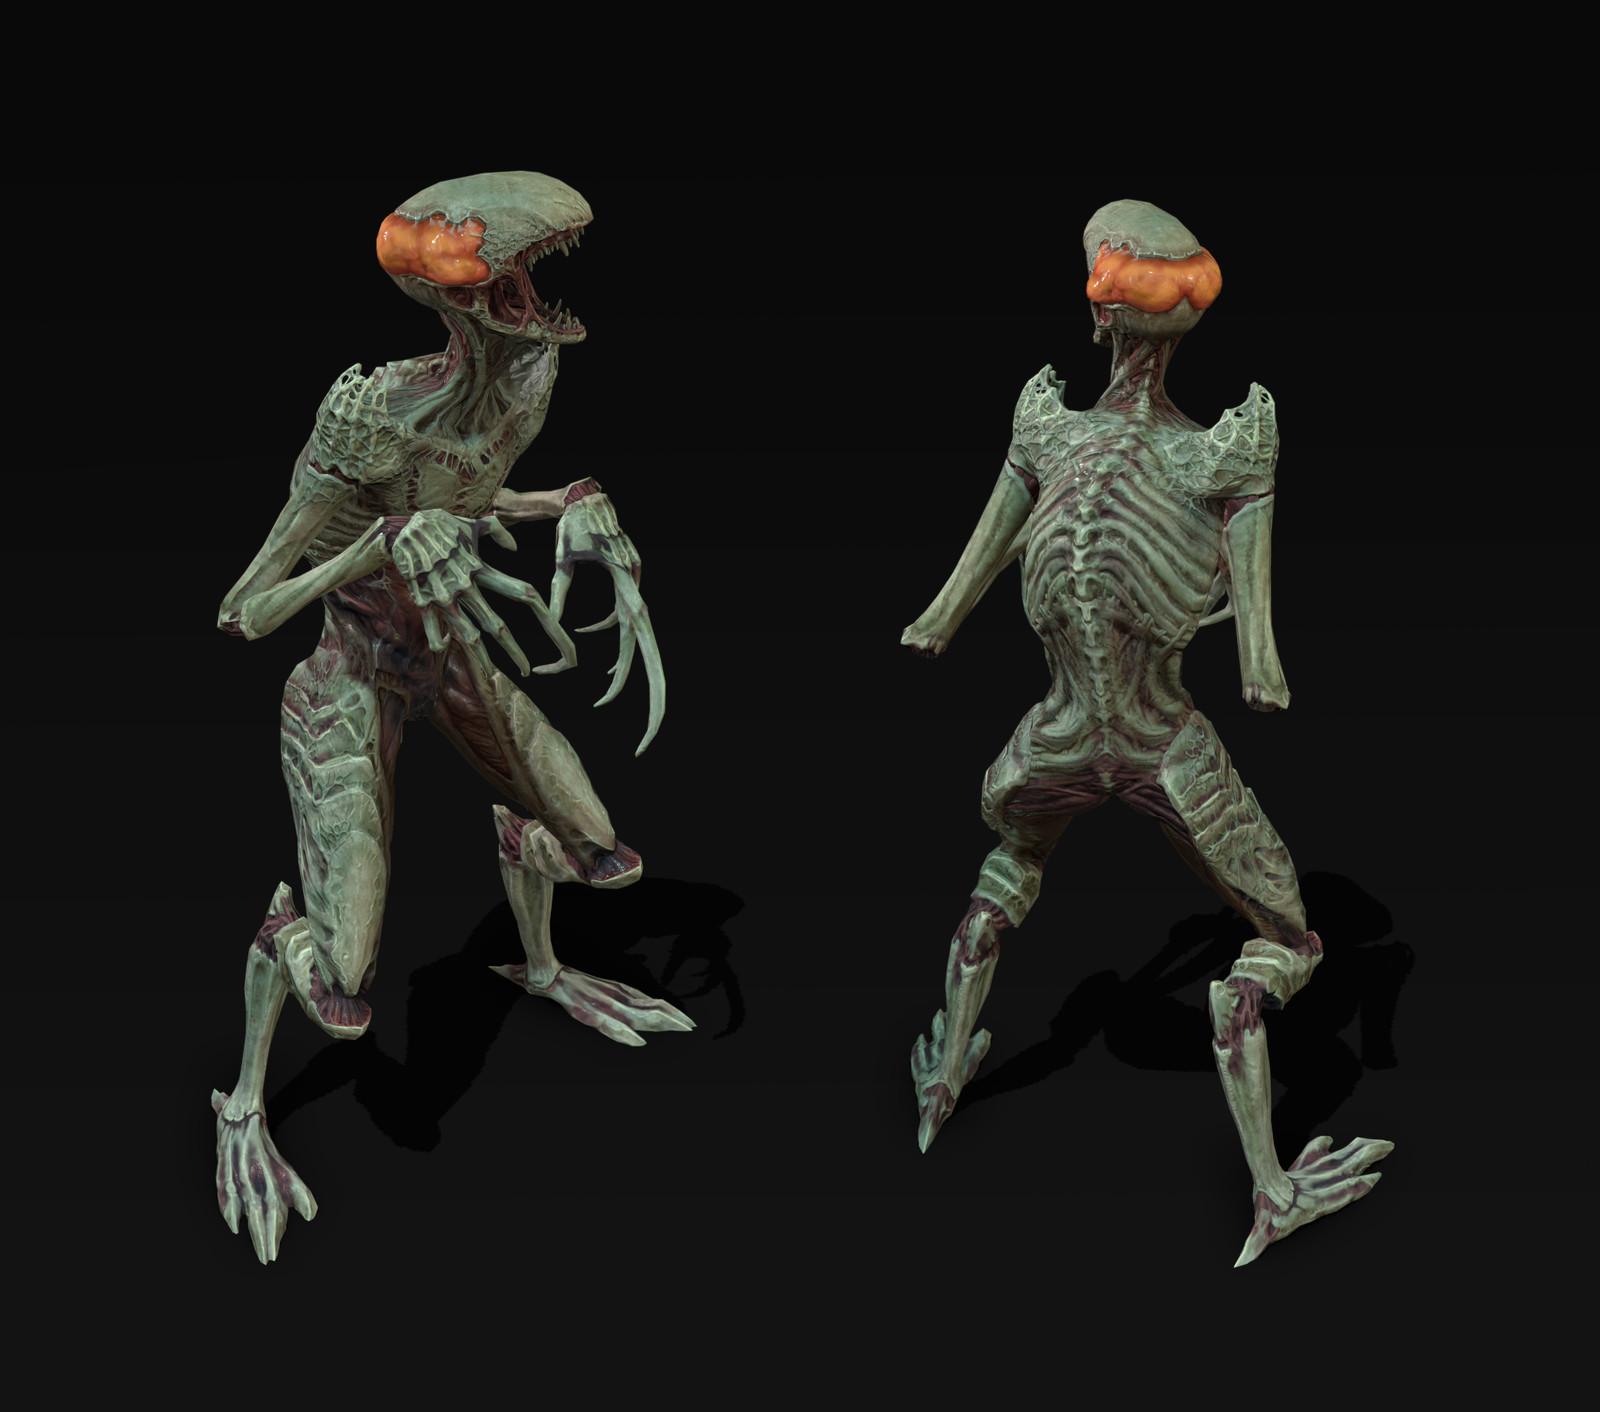 Creature rendered in Toolbag